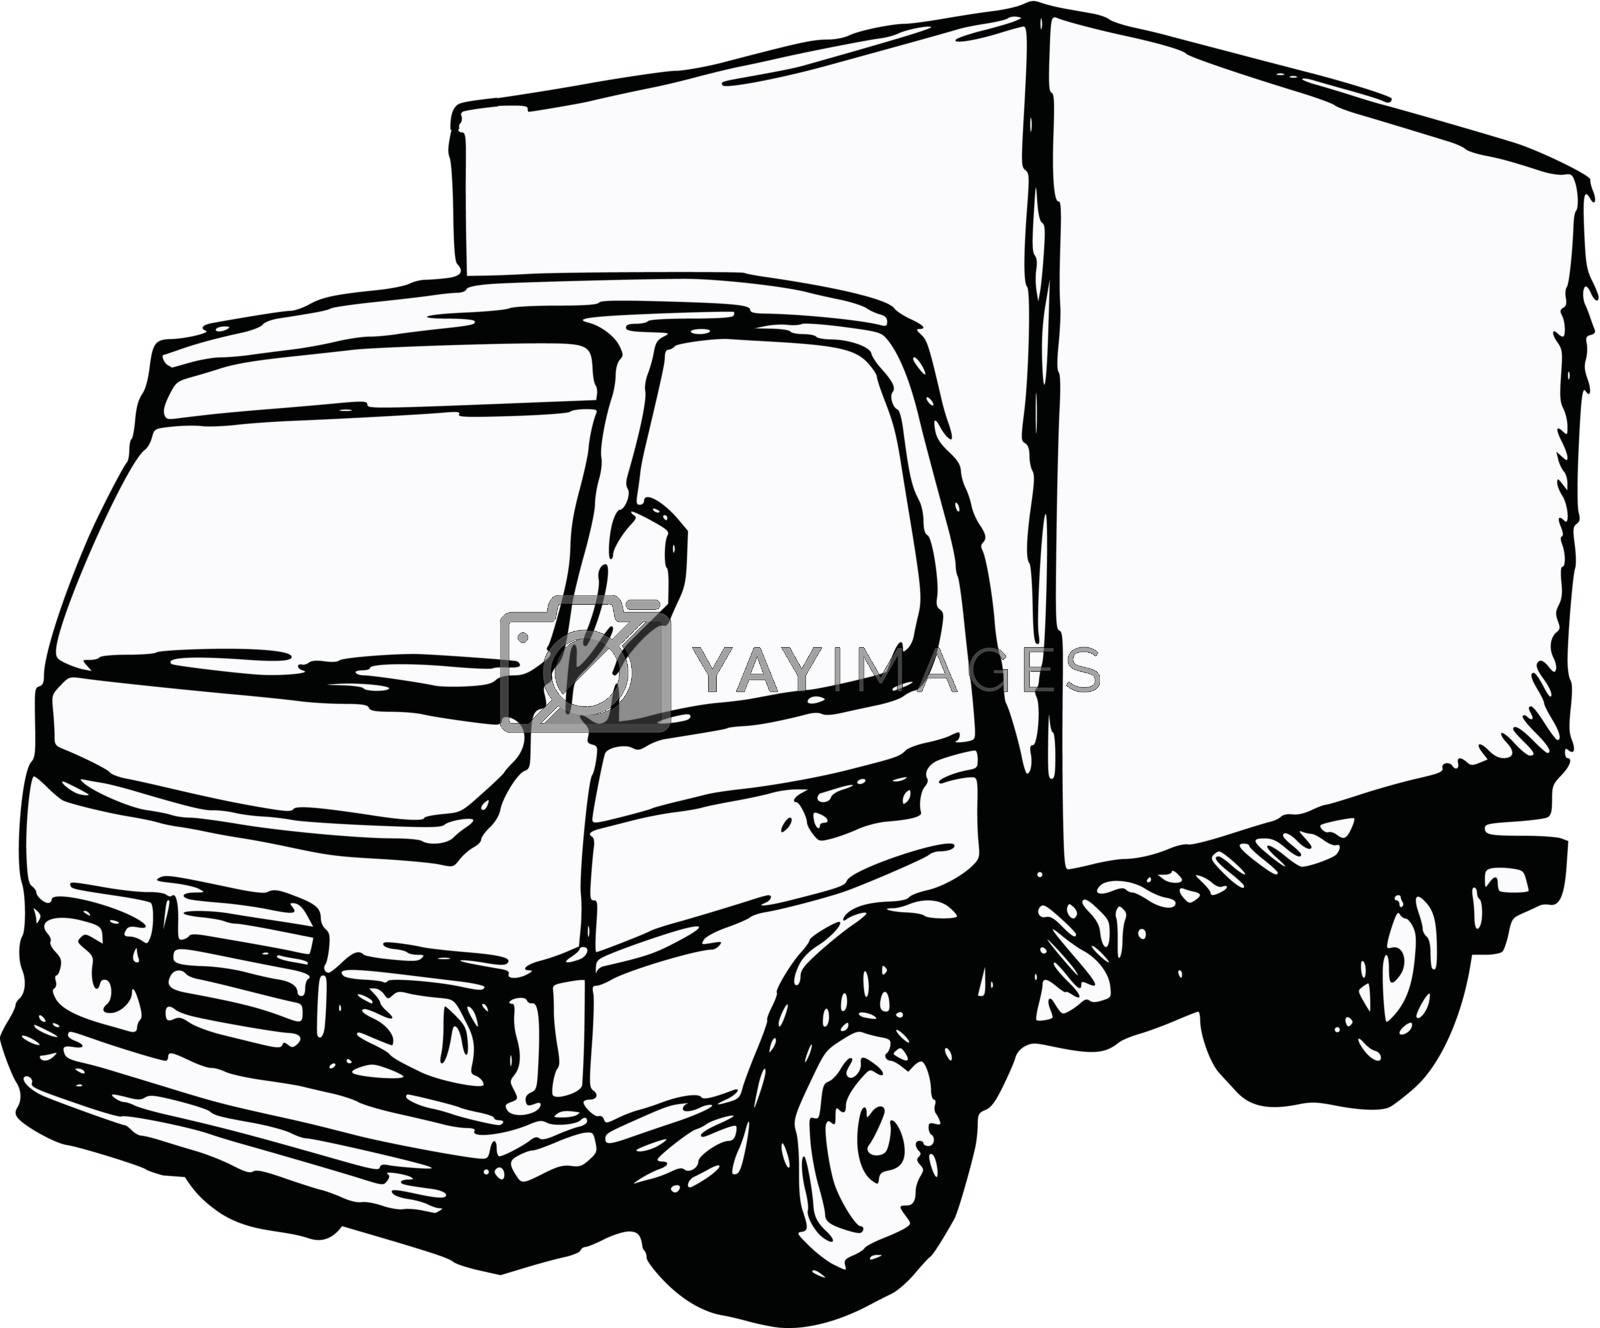 hand drawn, cartoon, sketch illustration of small truck